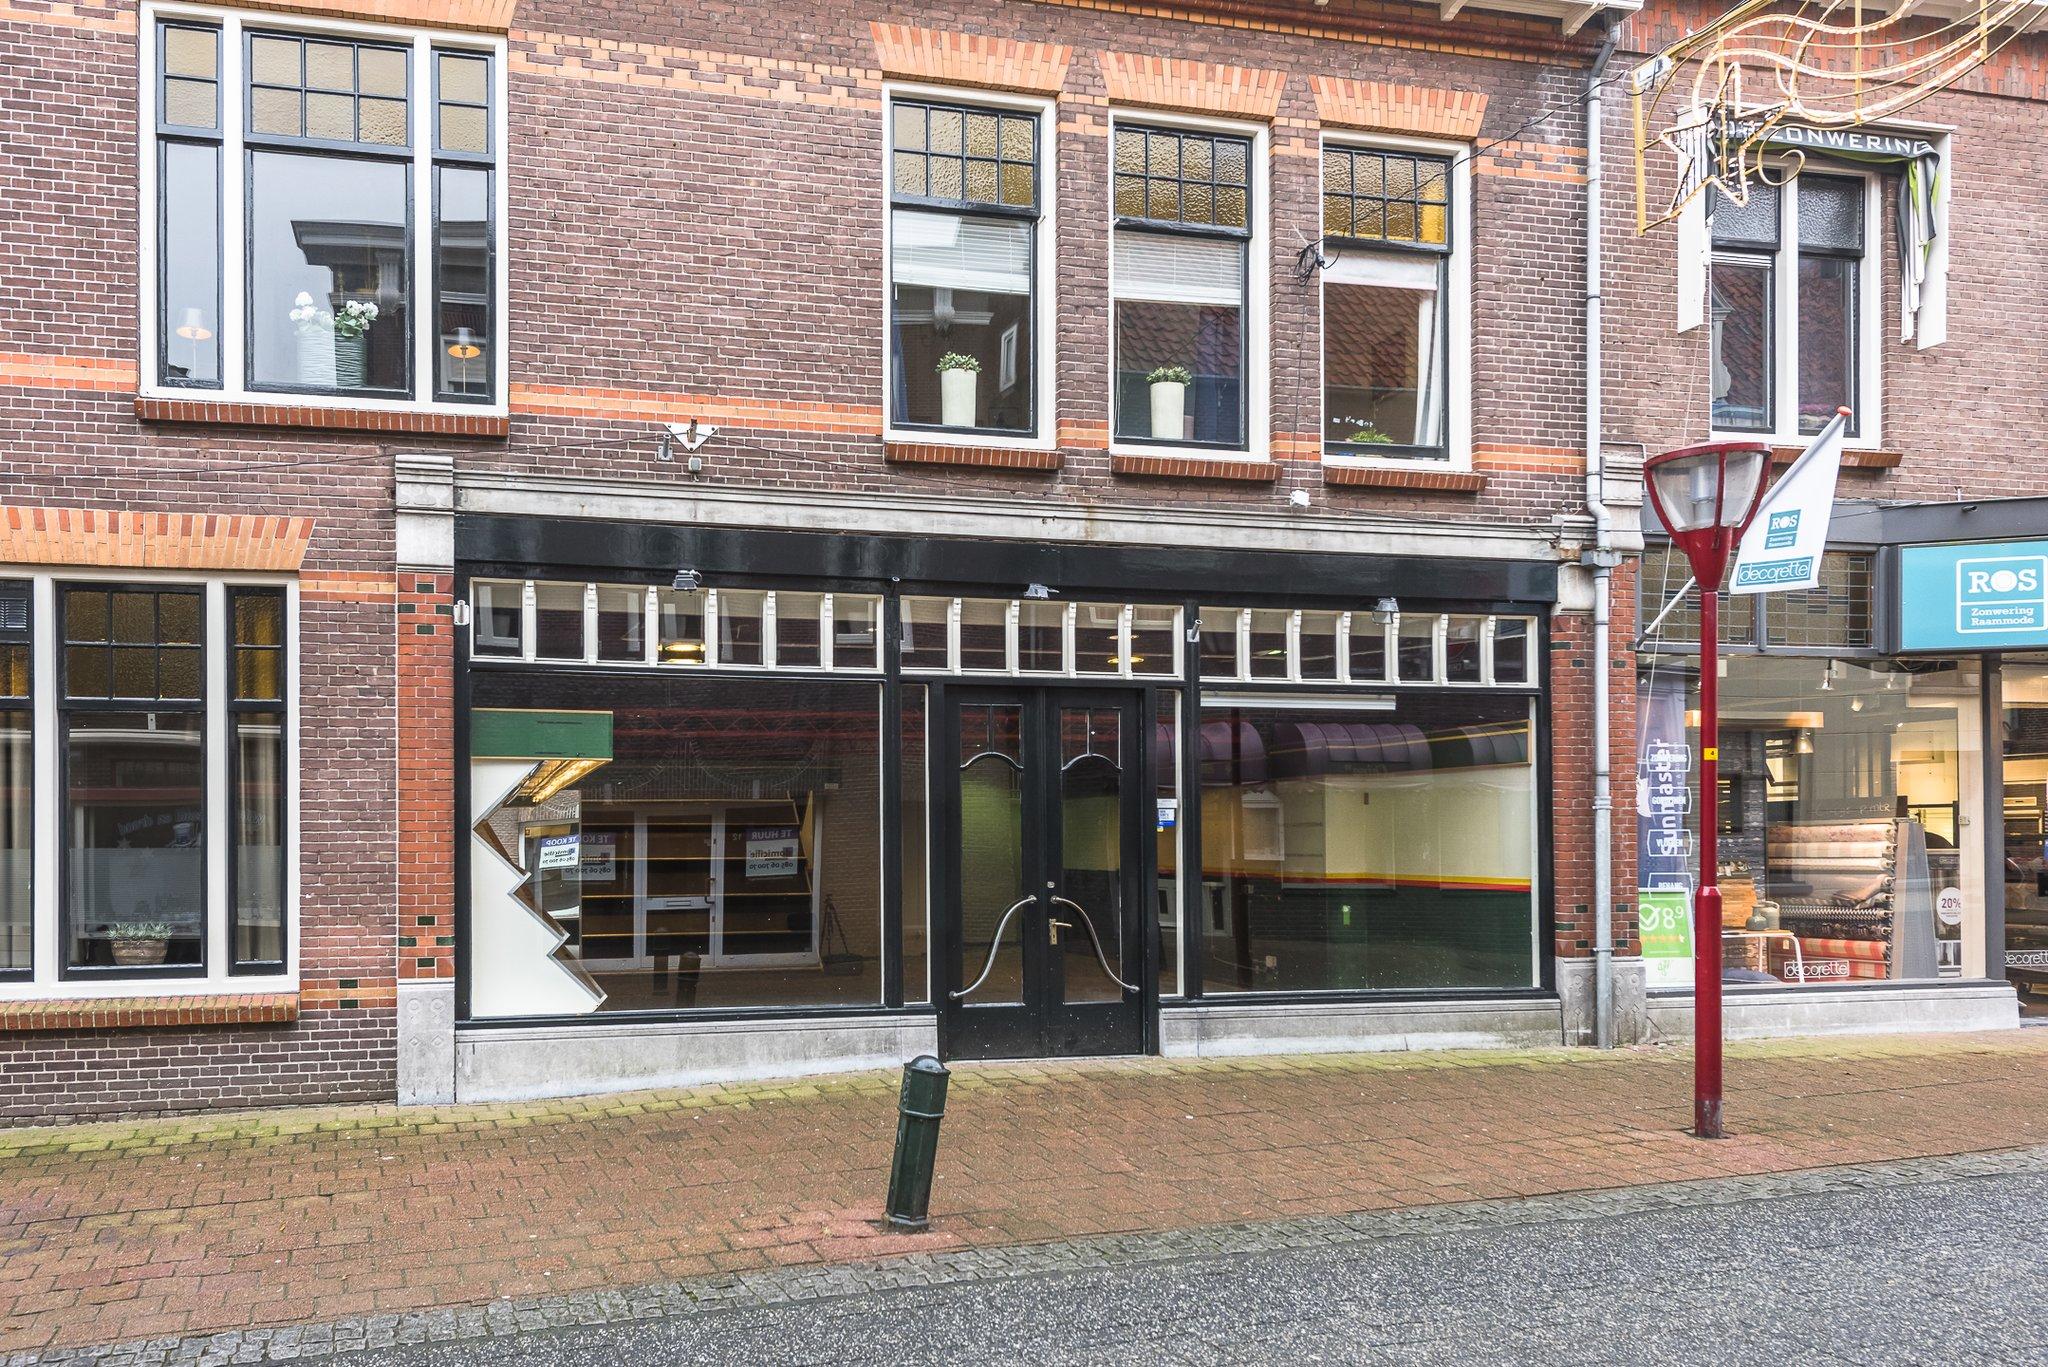 Langestraat 15 3861 BM te Nijkerk